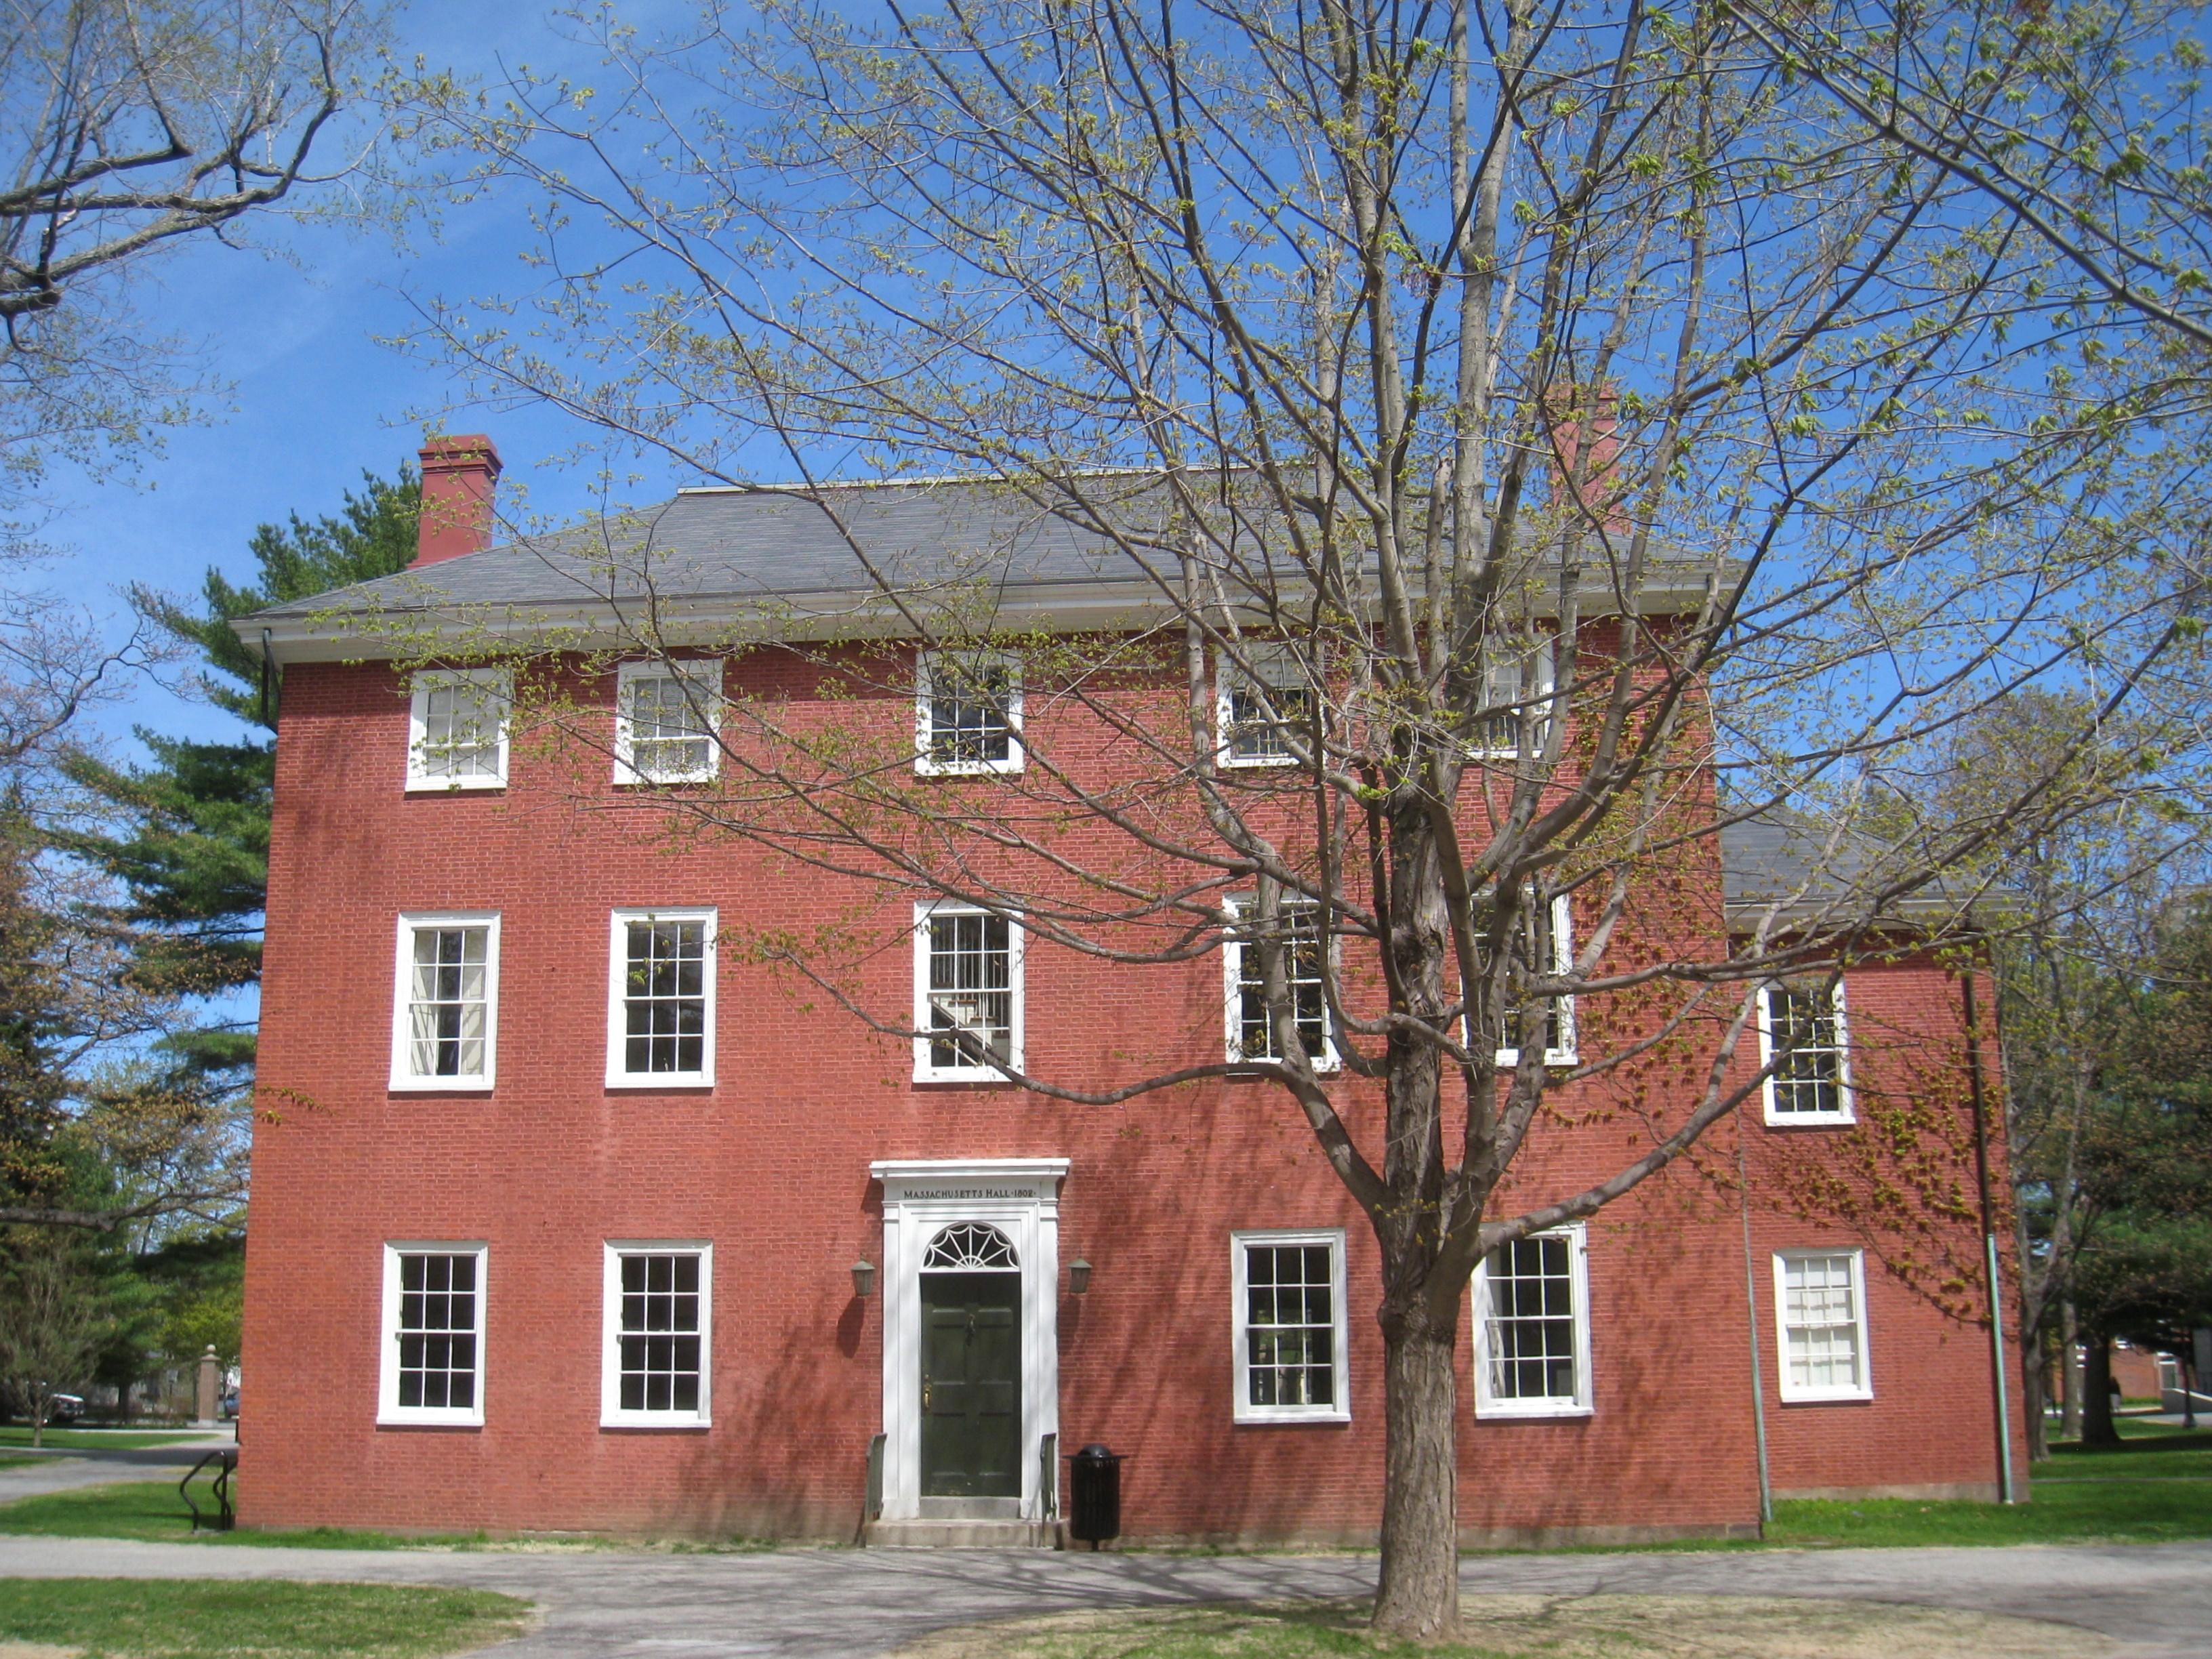 Filemassachusetts hall bowdoin college img 7822g wikimedia filemassachusetts hall bowdoin college img 7822g publicscrutiny Images